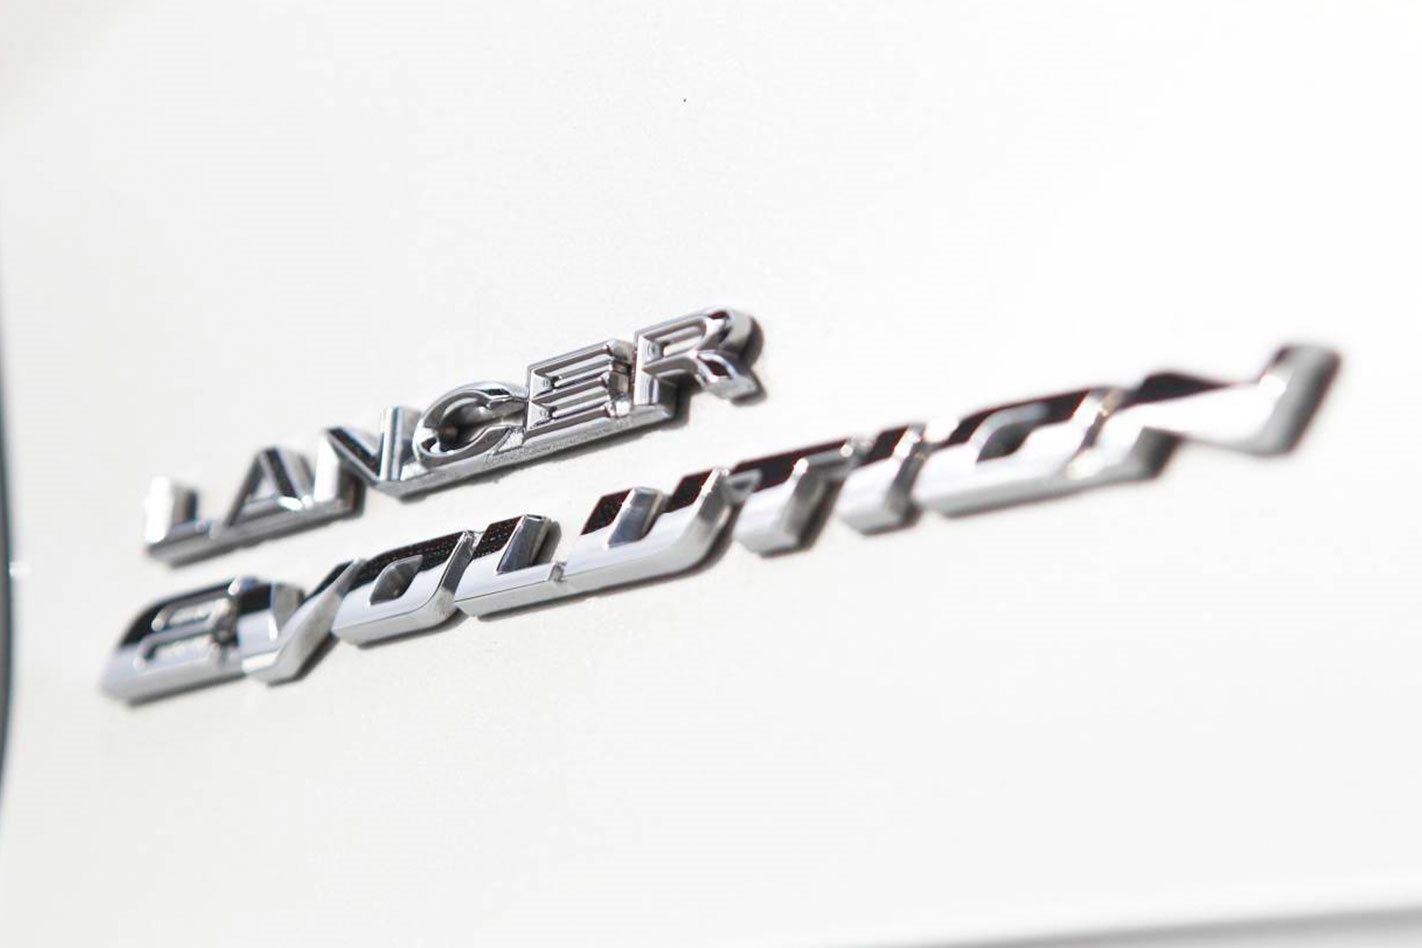 Mitsubishi sets Evo X replacement timeline